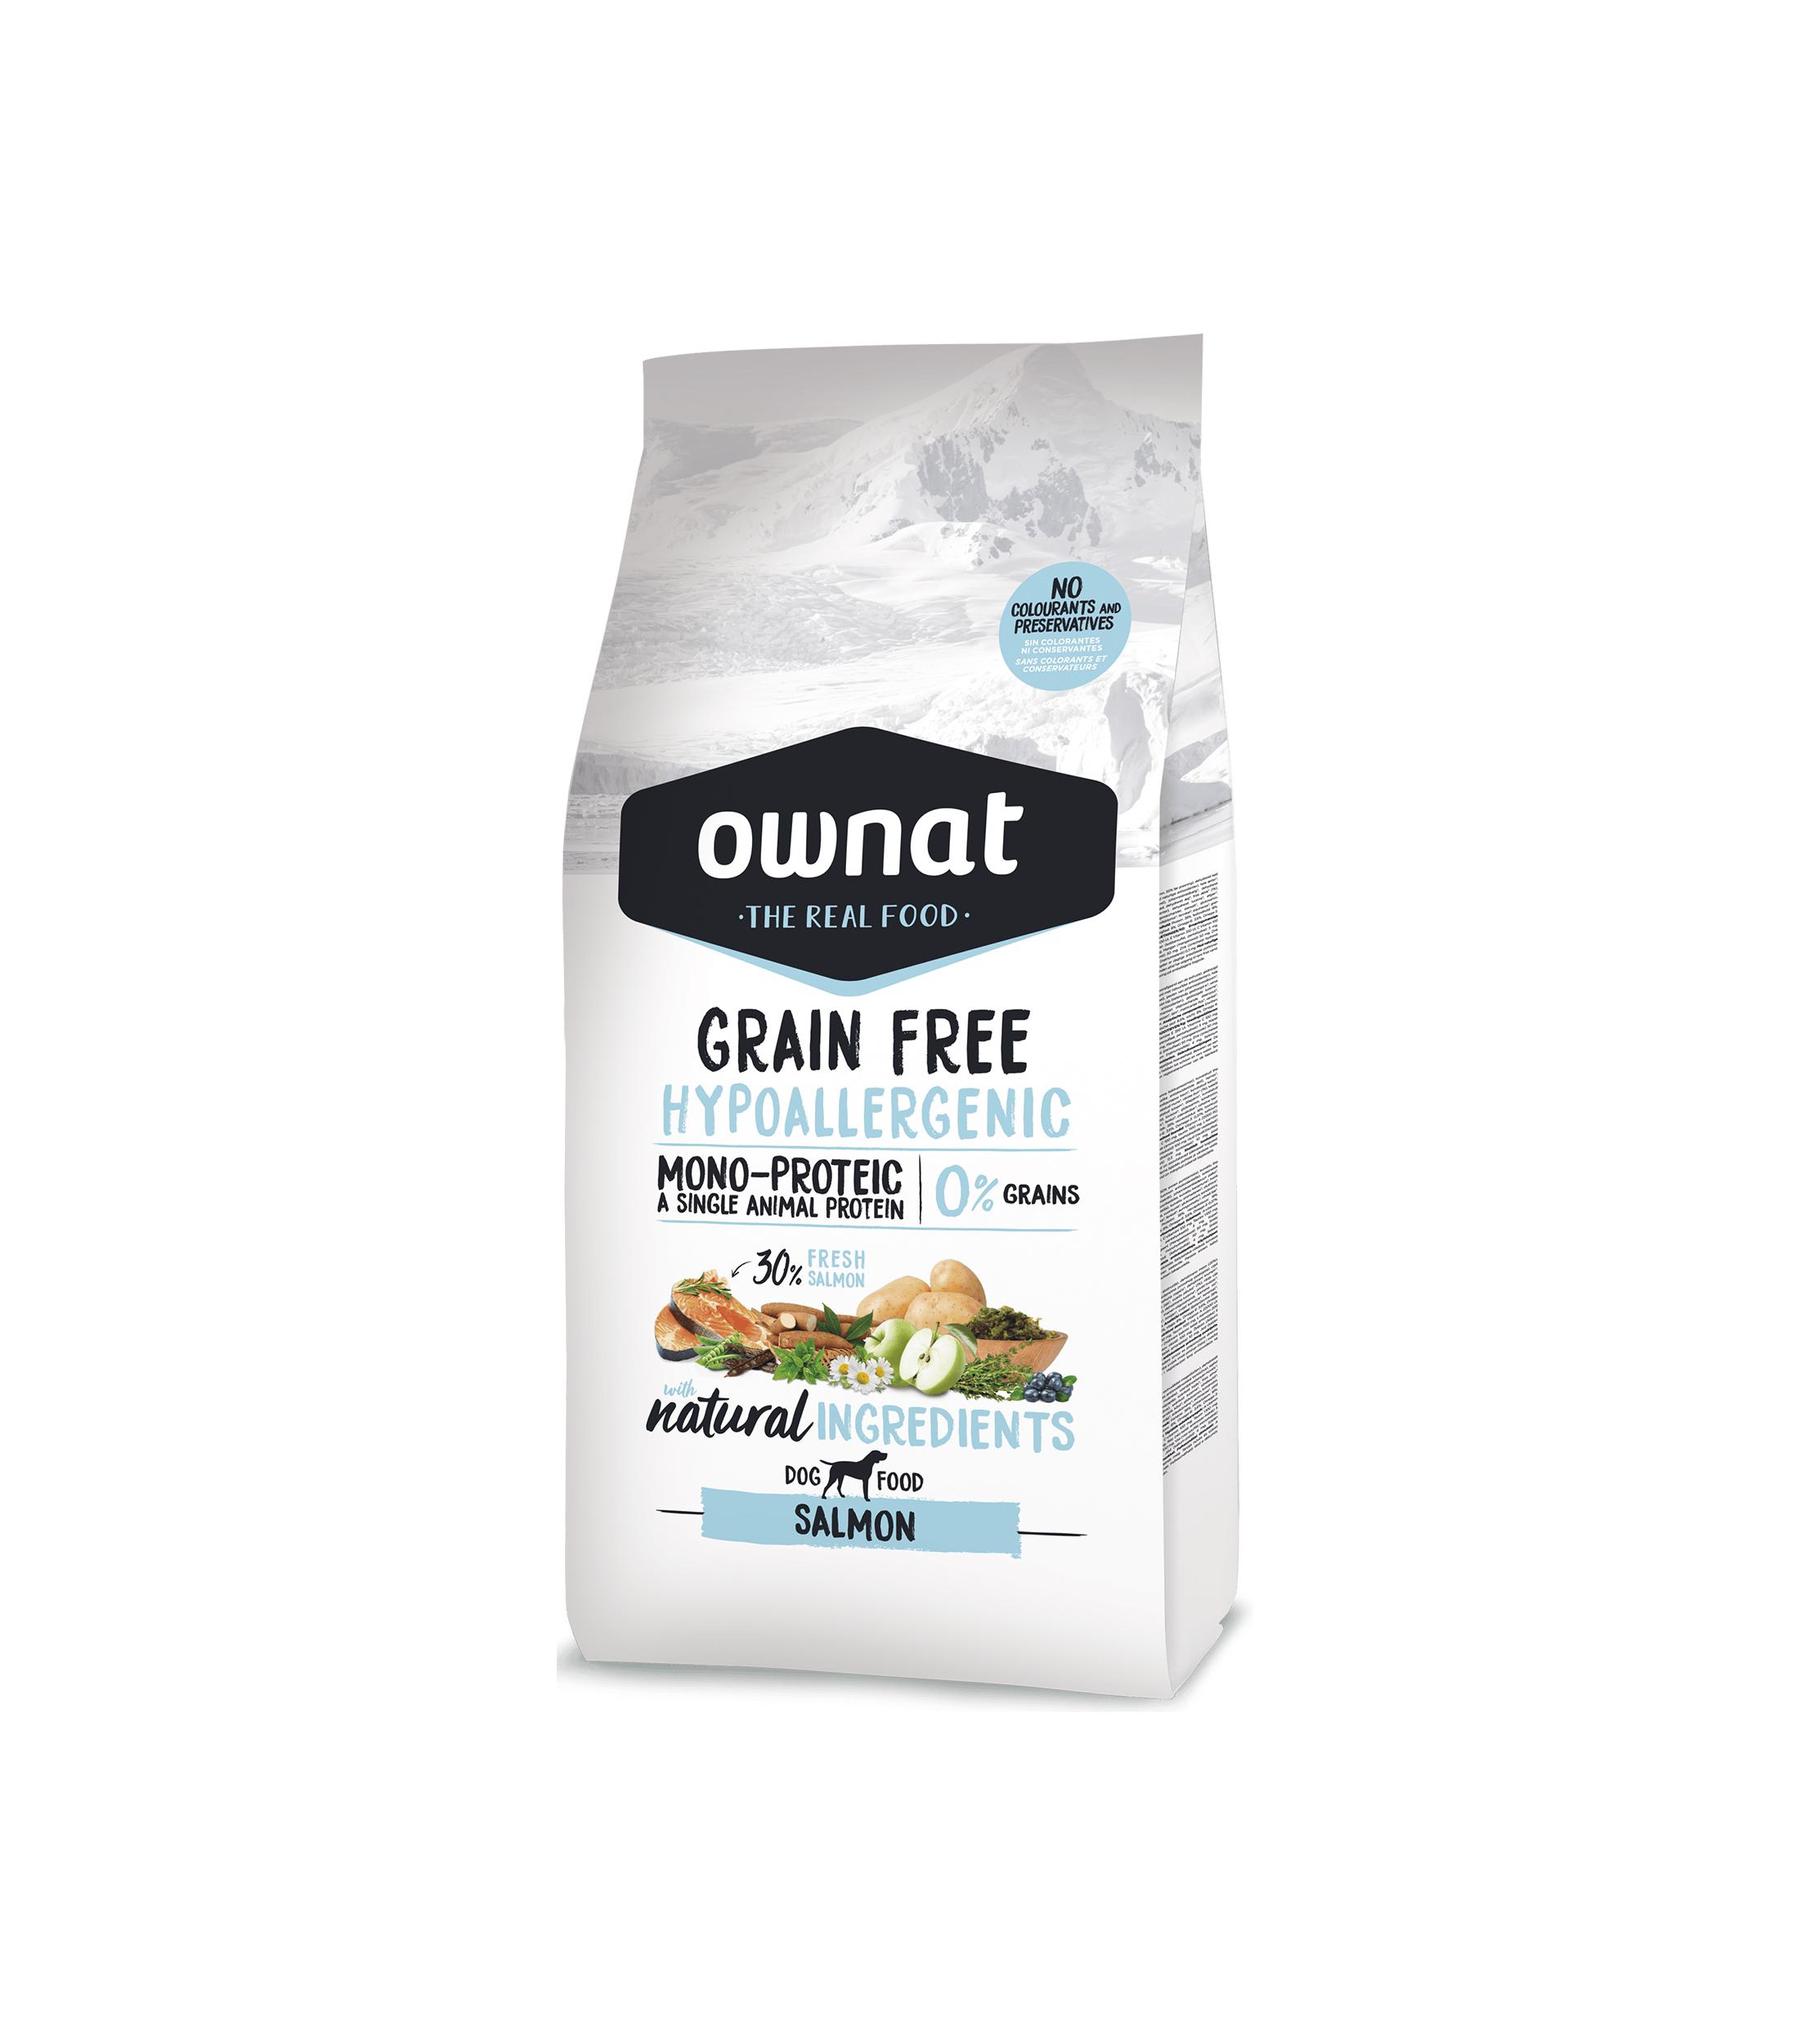 Ownat Grain Free Hypoallergenic Salmón